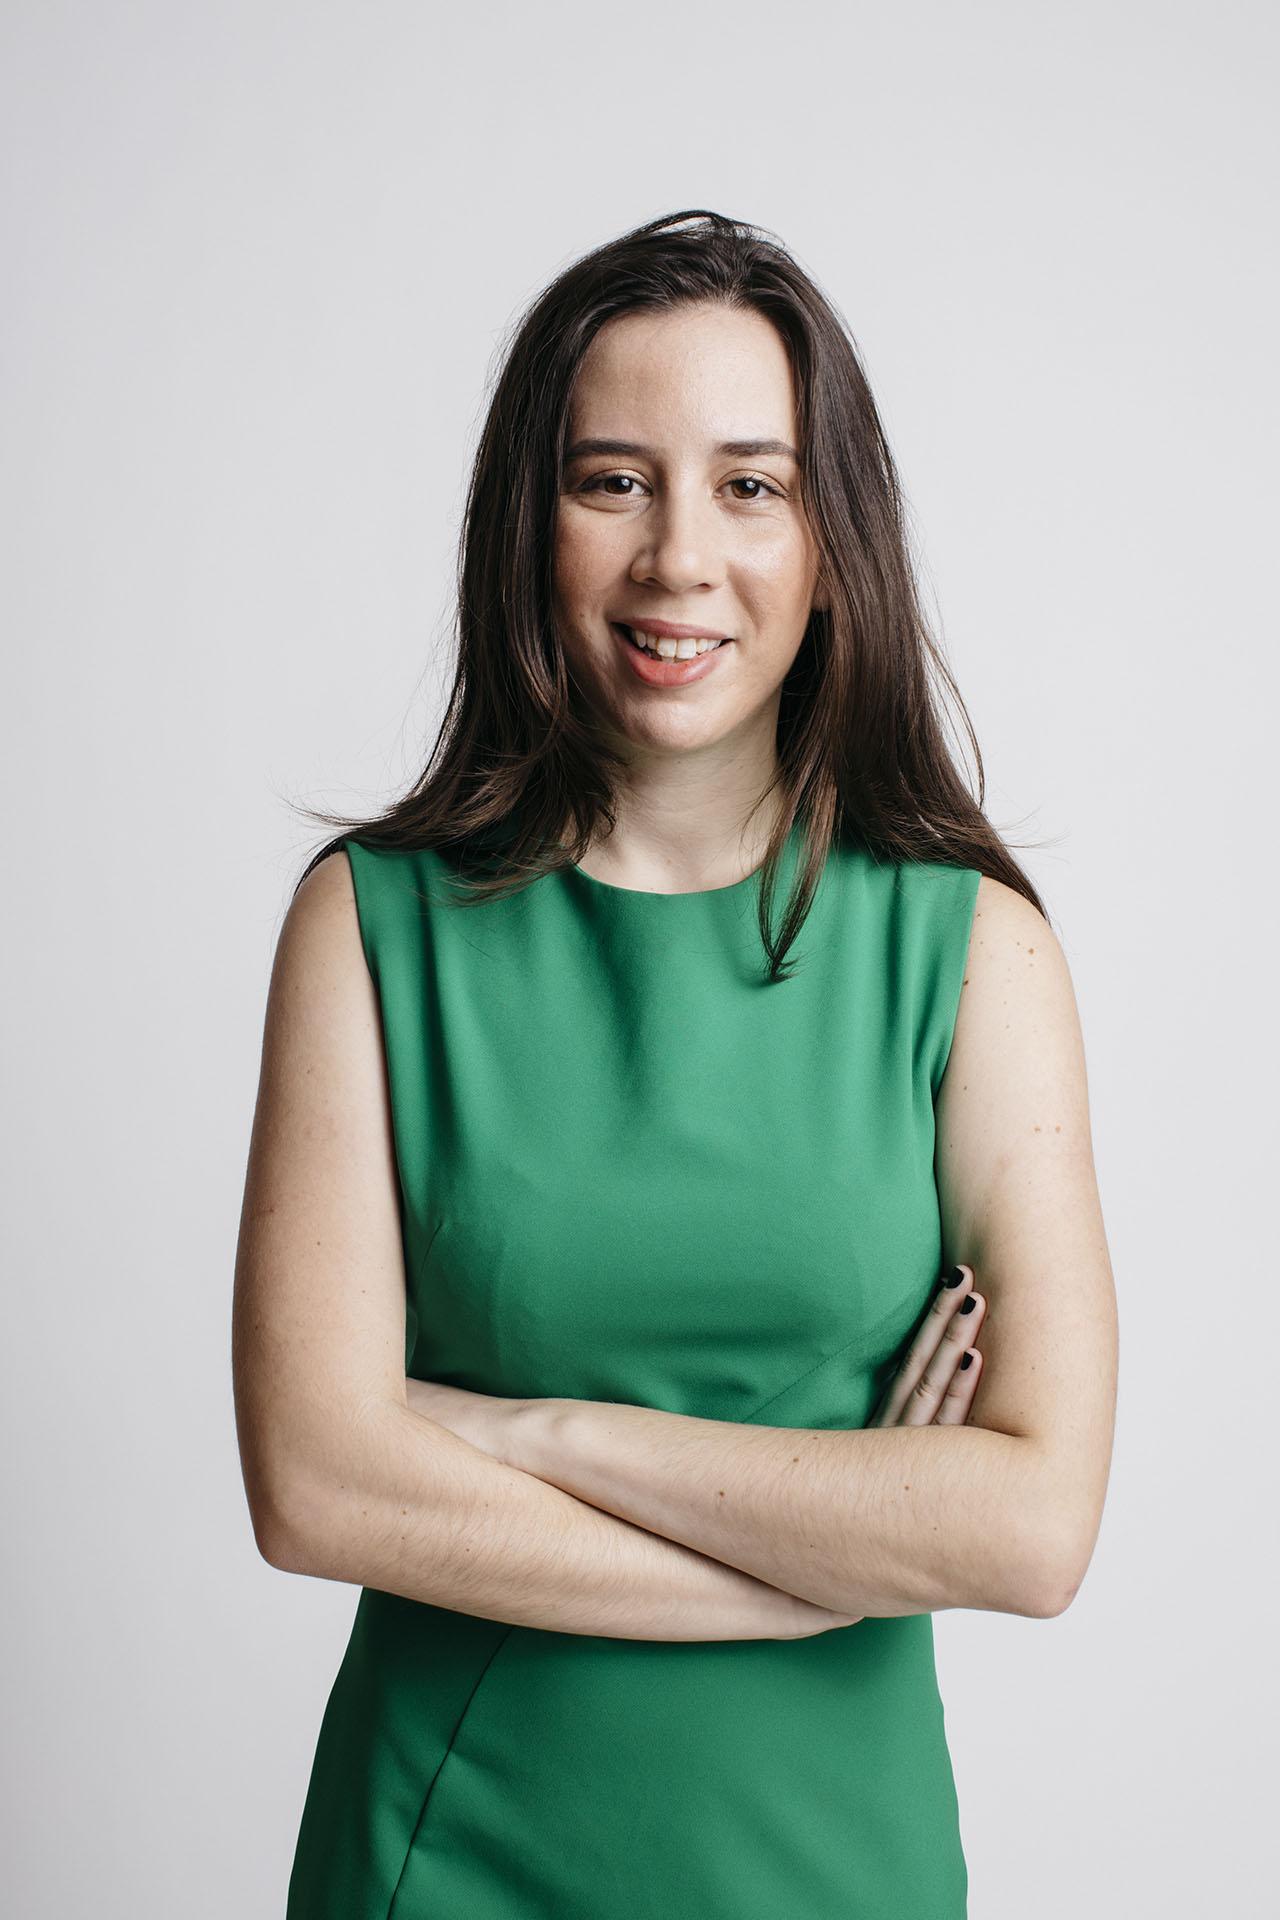 Sarah Berlenbach